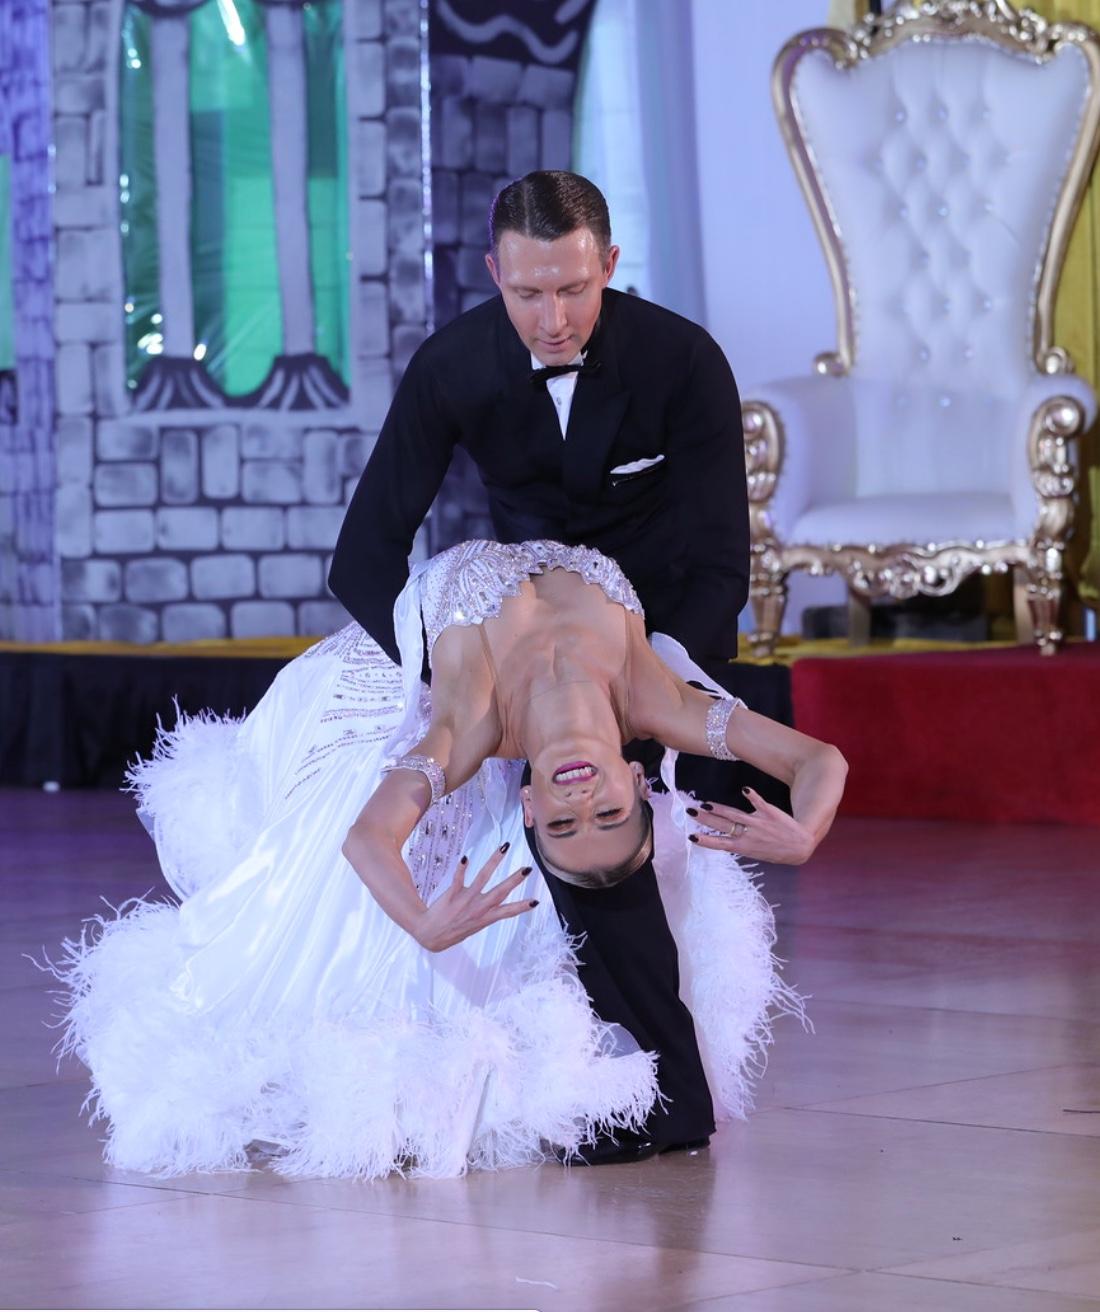 Arunas & Katusha ballroom dance champions at Music City Invitational